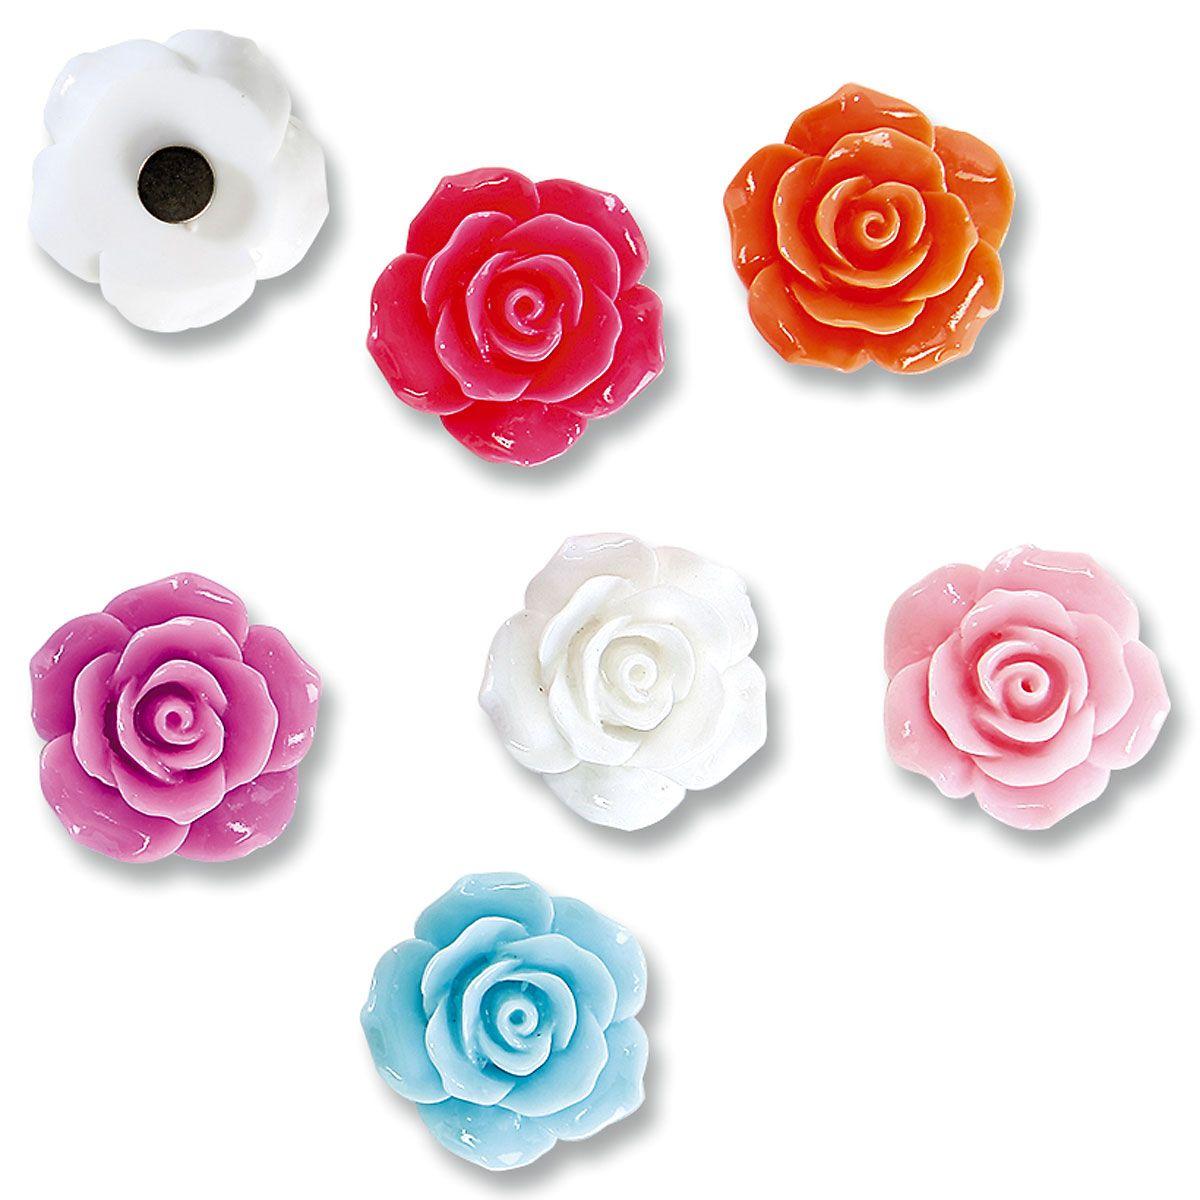 Decorative Roses Magnet Set